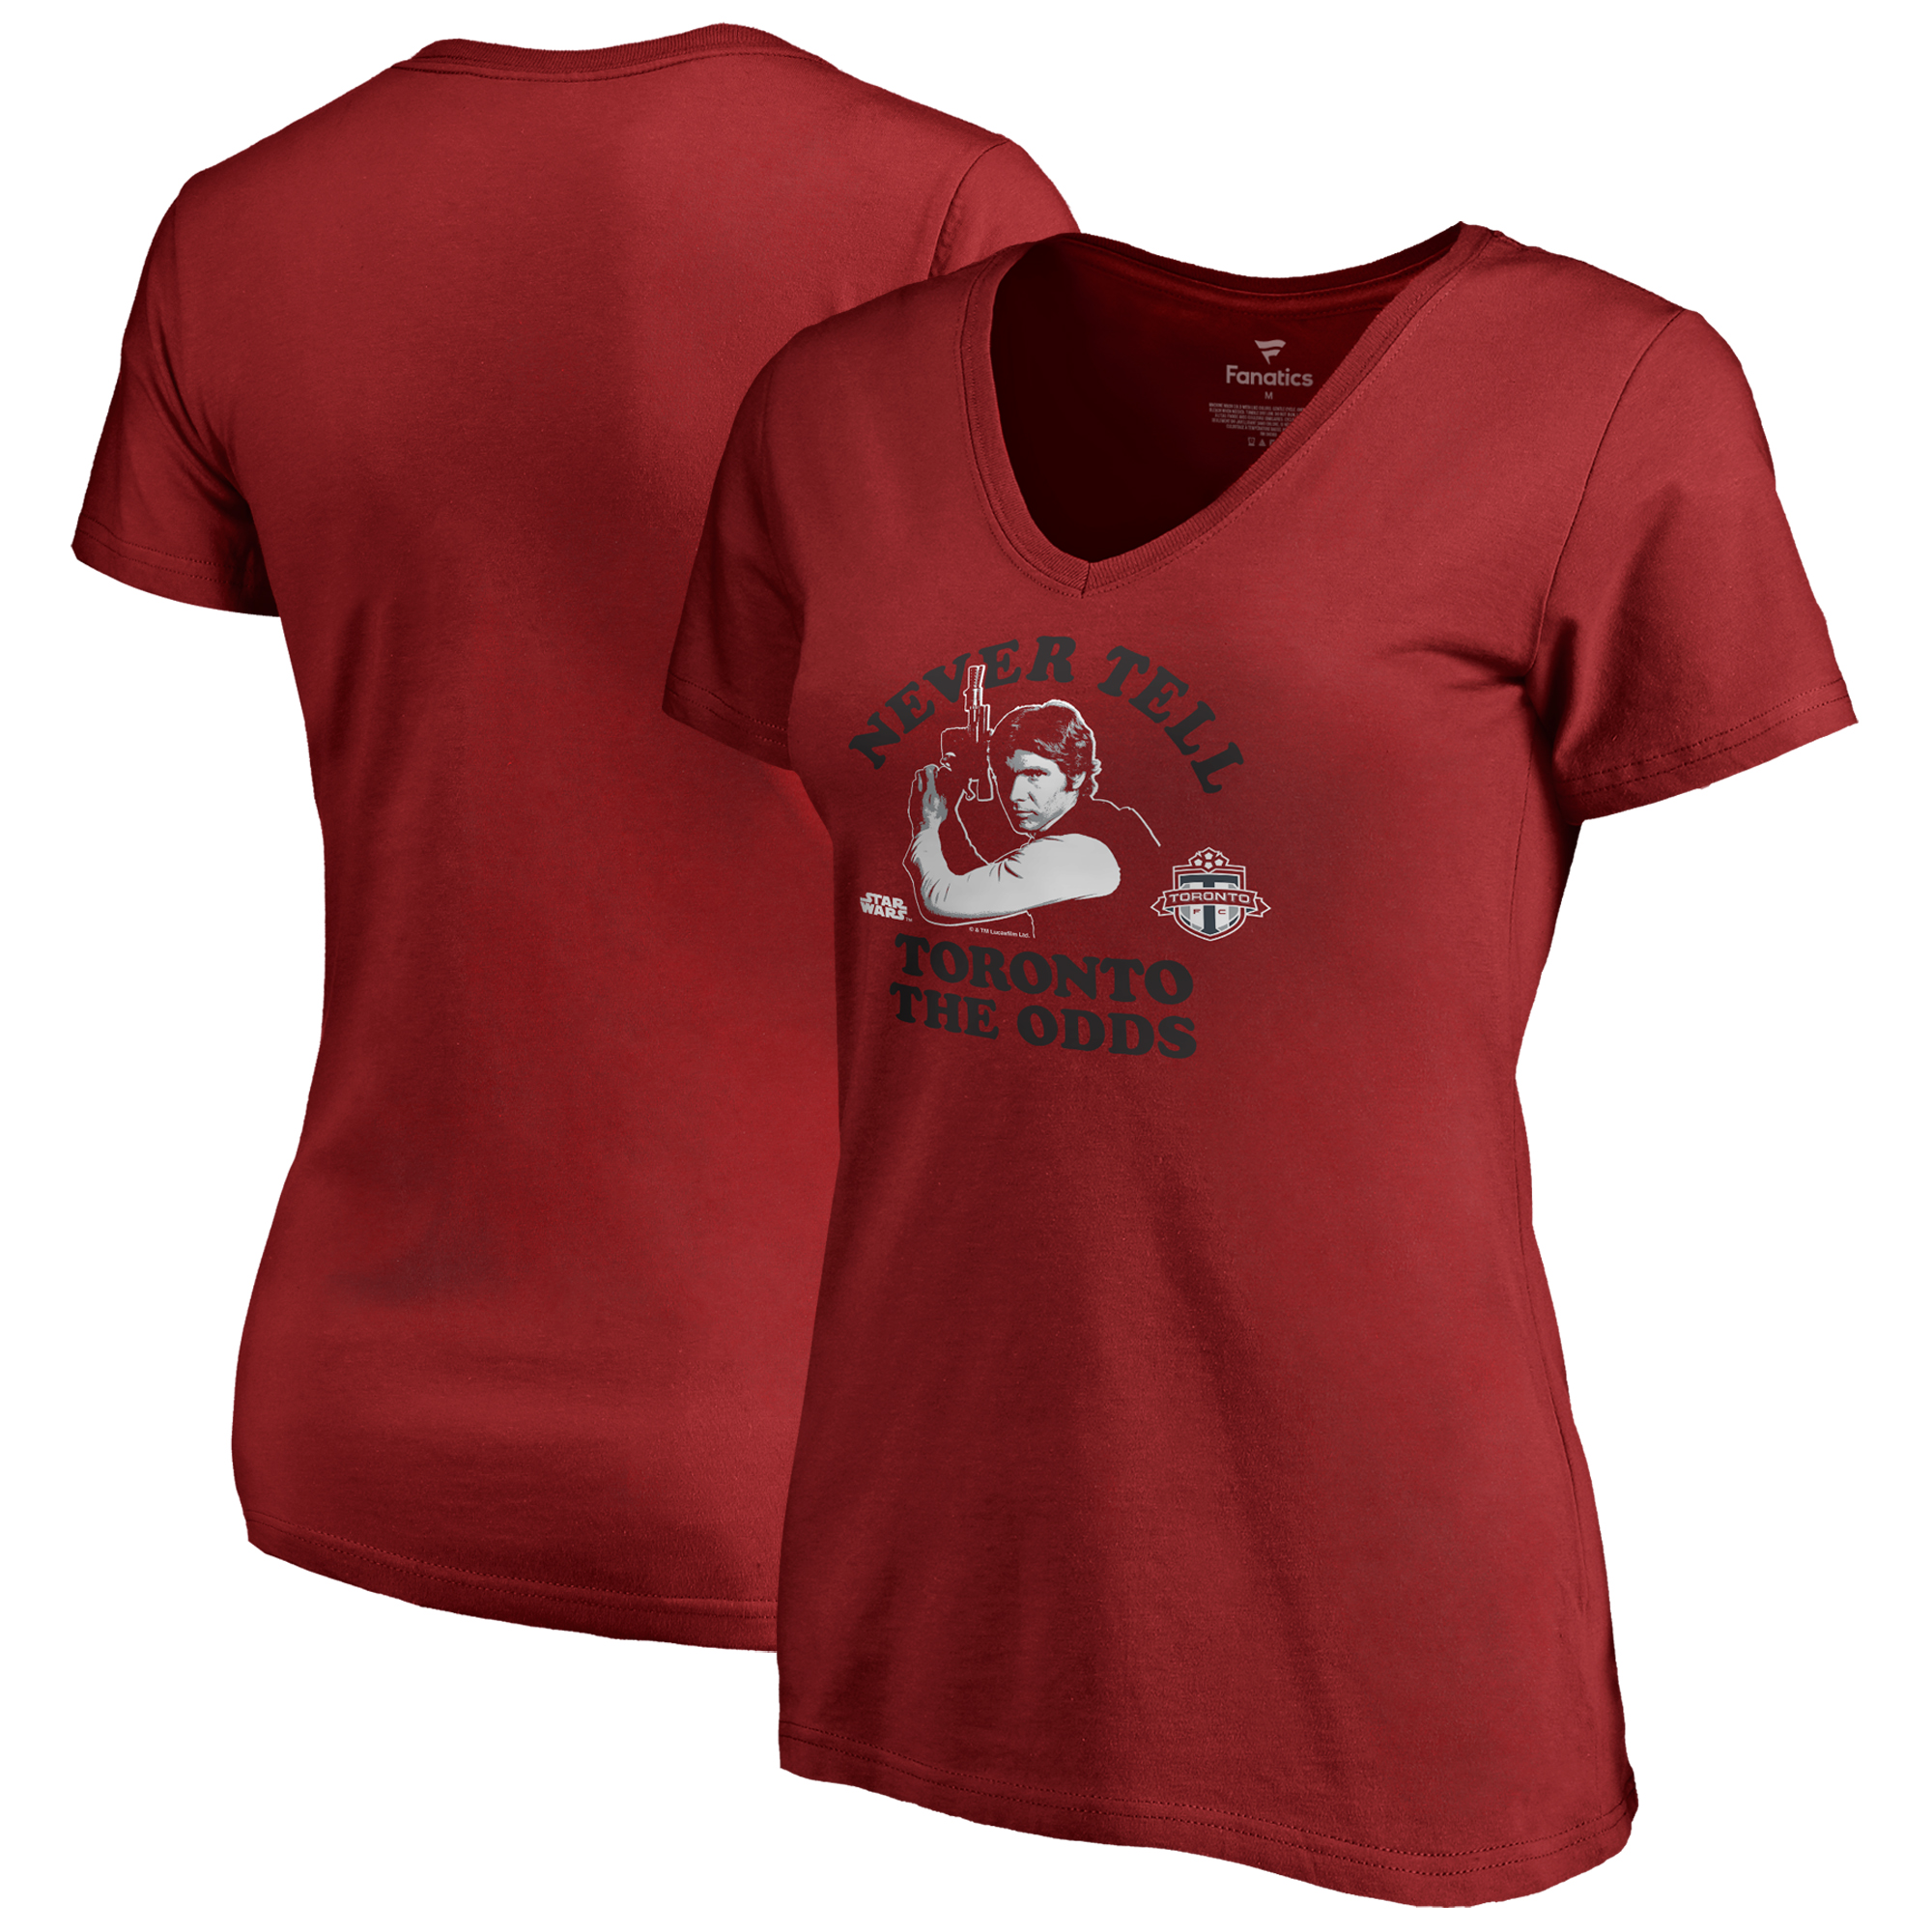 Toronto FC Fanatics Branded Women's Star Wars Never Tell the Odds V-Neck T-Shirt - Red